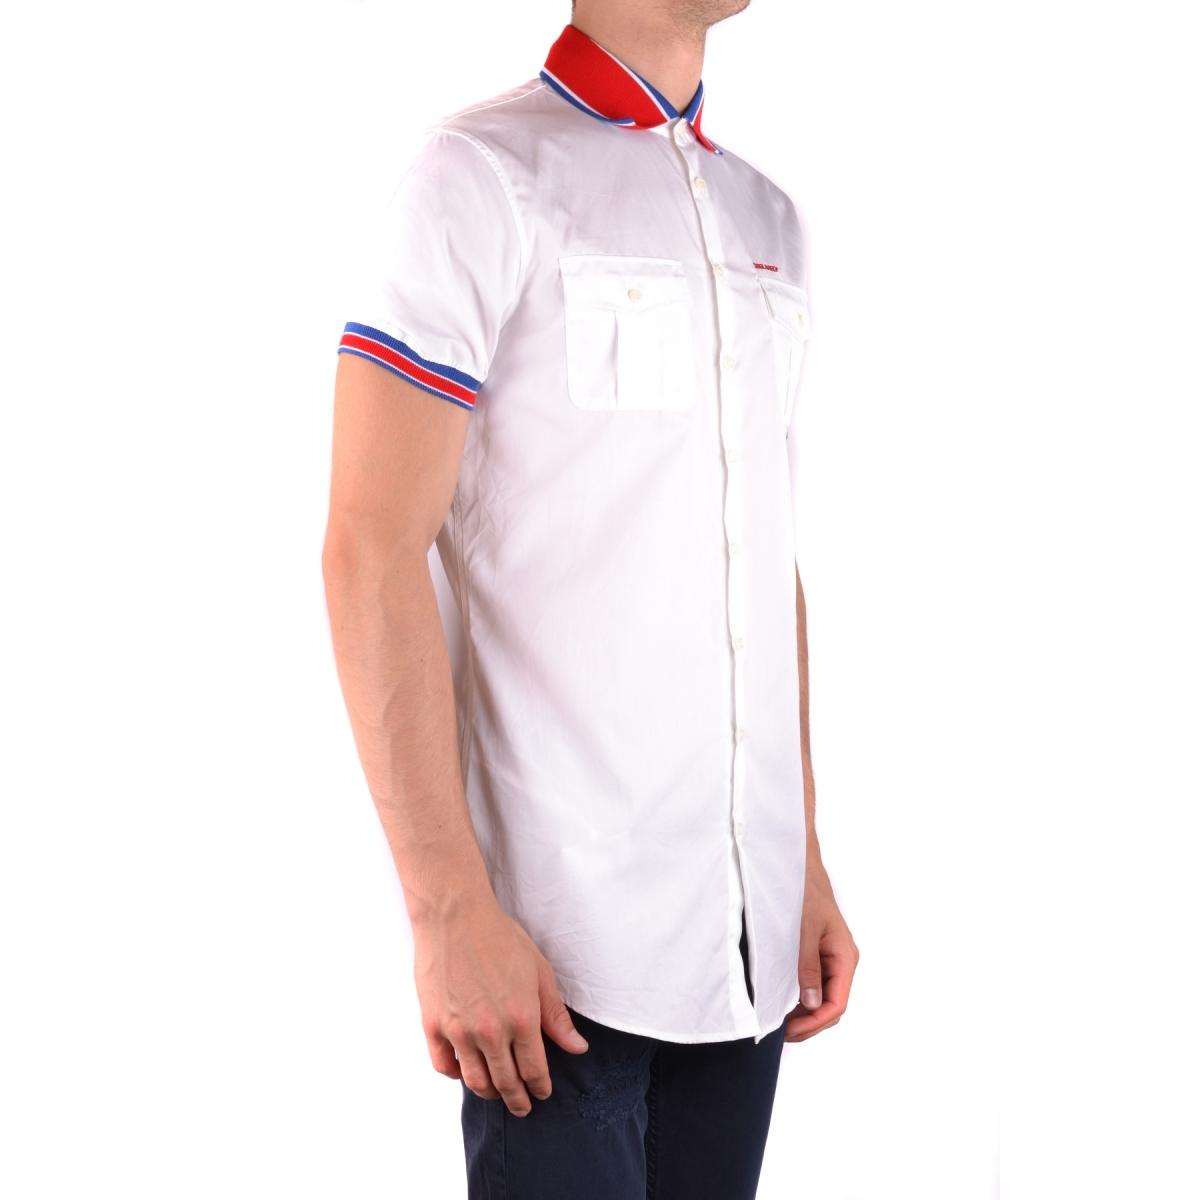 Camicia Dsquared 34512IT -30% 2 2 sur 3 ... 4dcf9ee8c04f